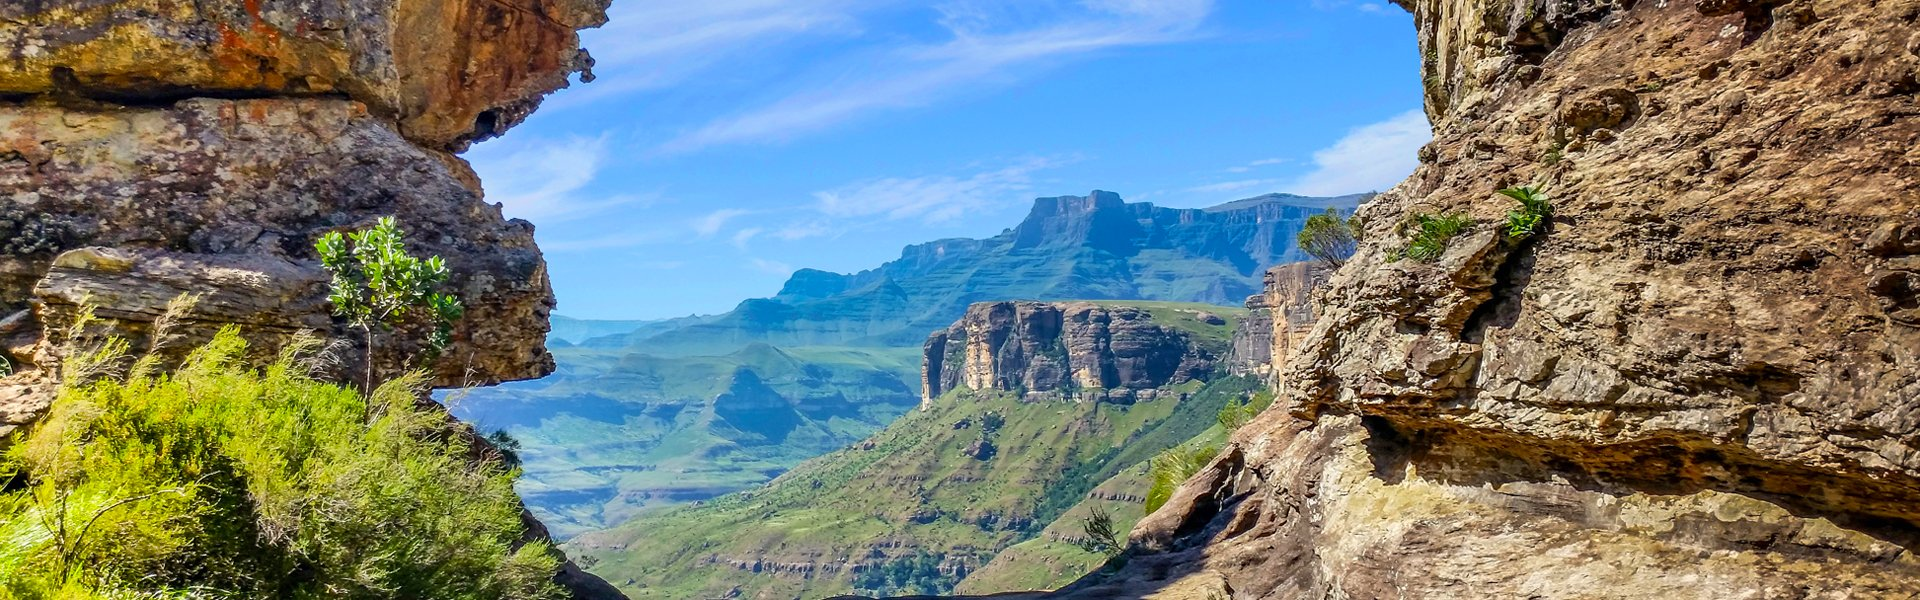 Drakensbergen, Zuid-Afrika